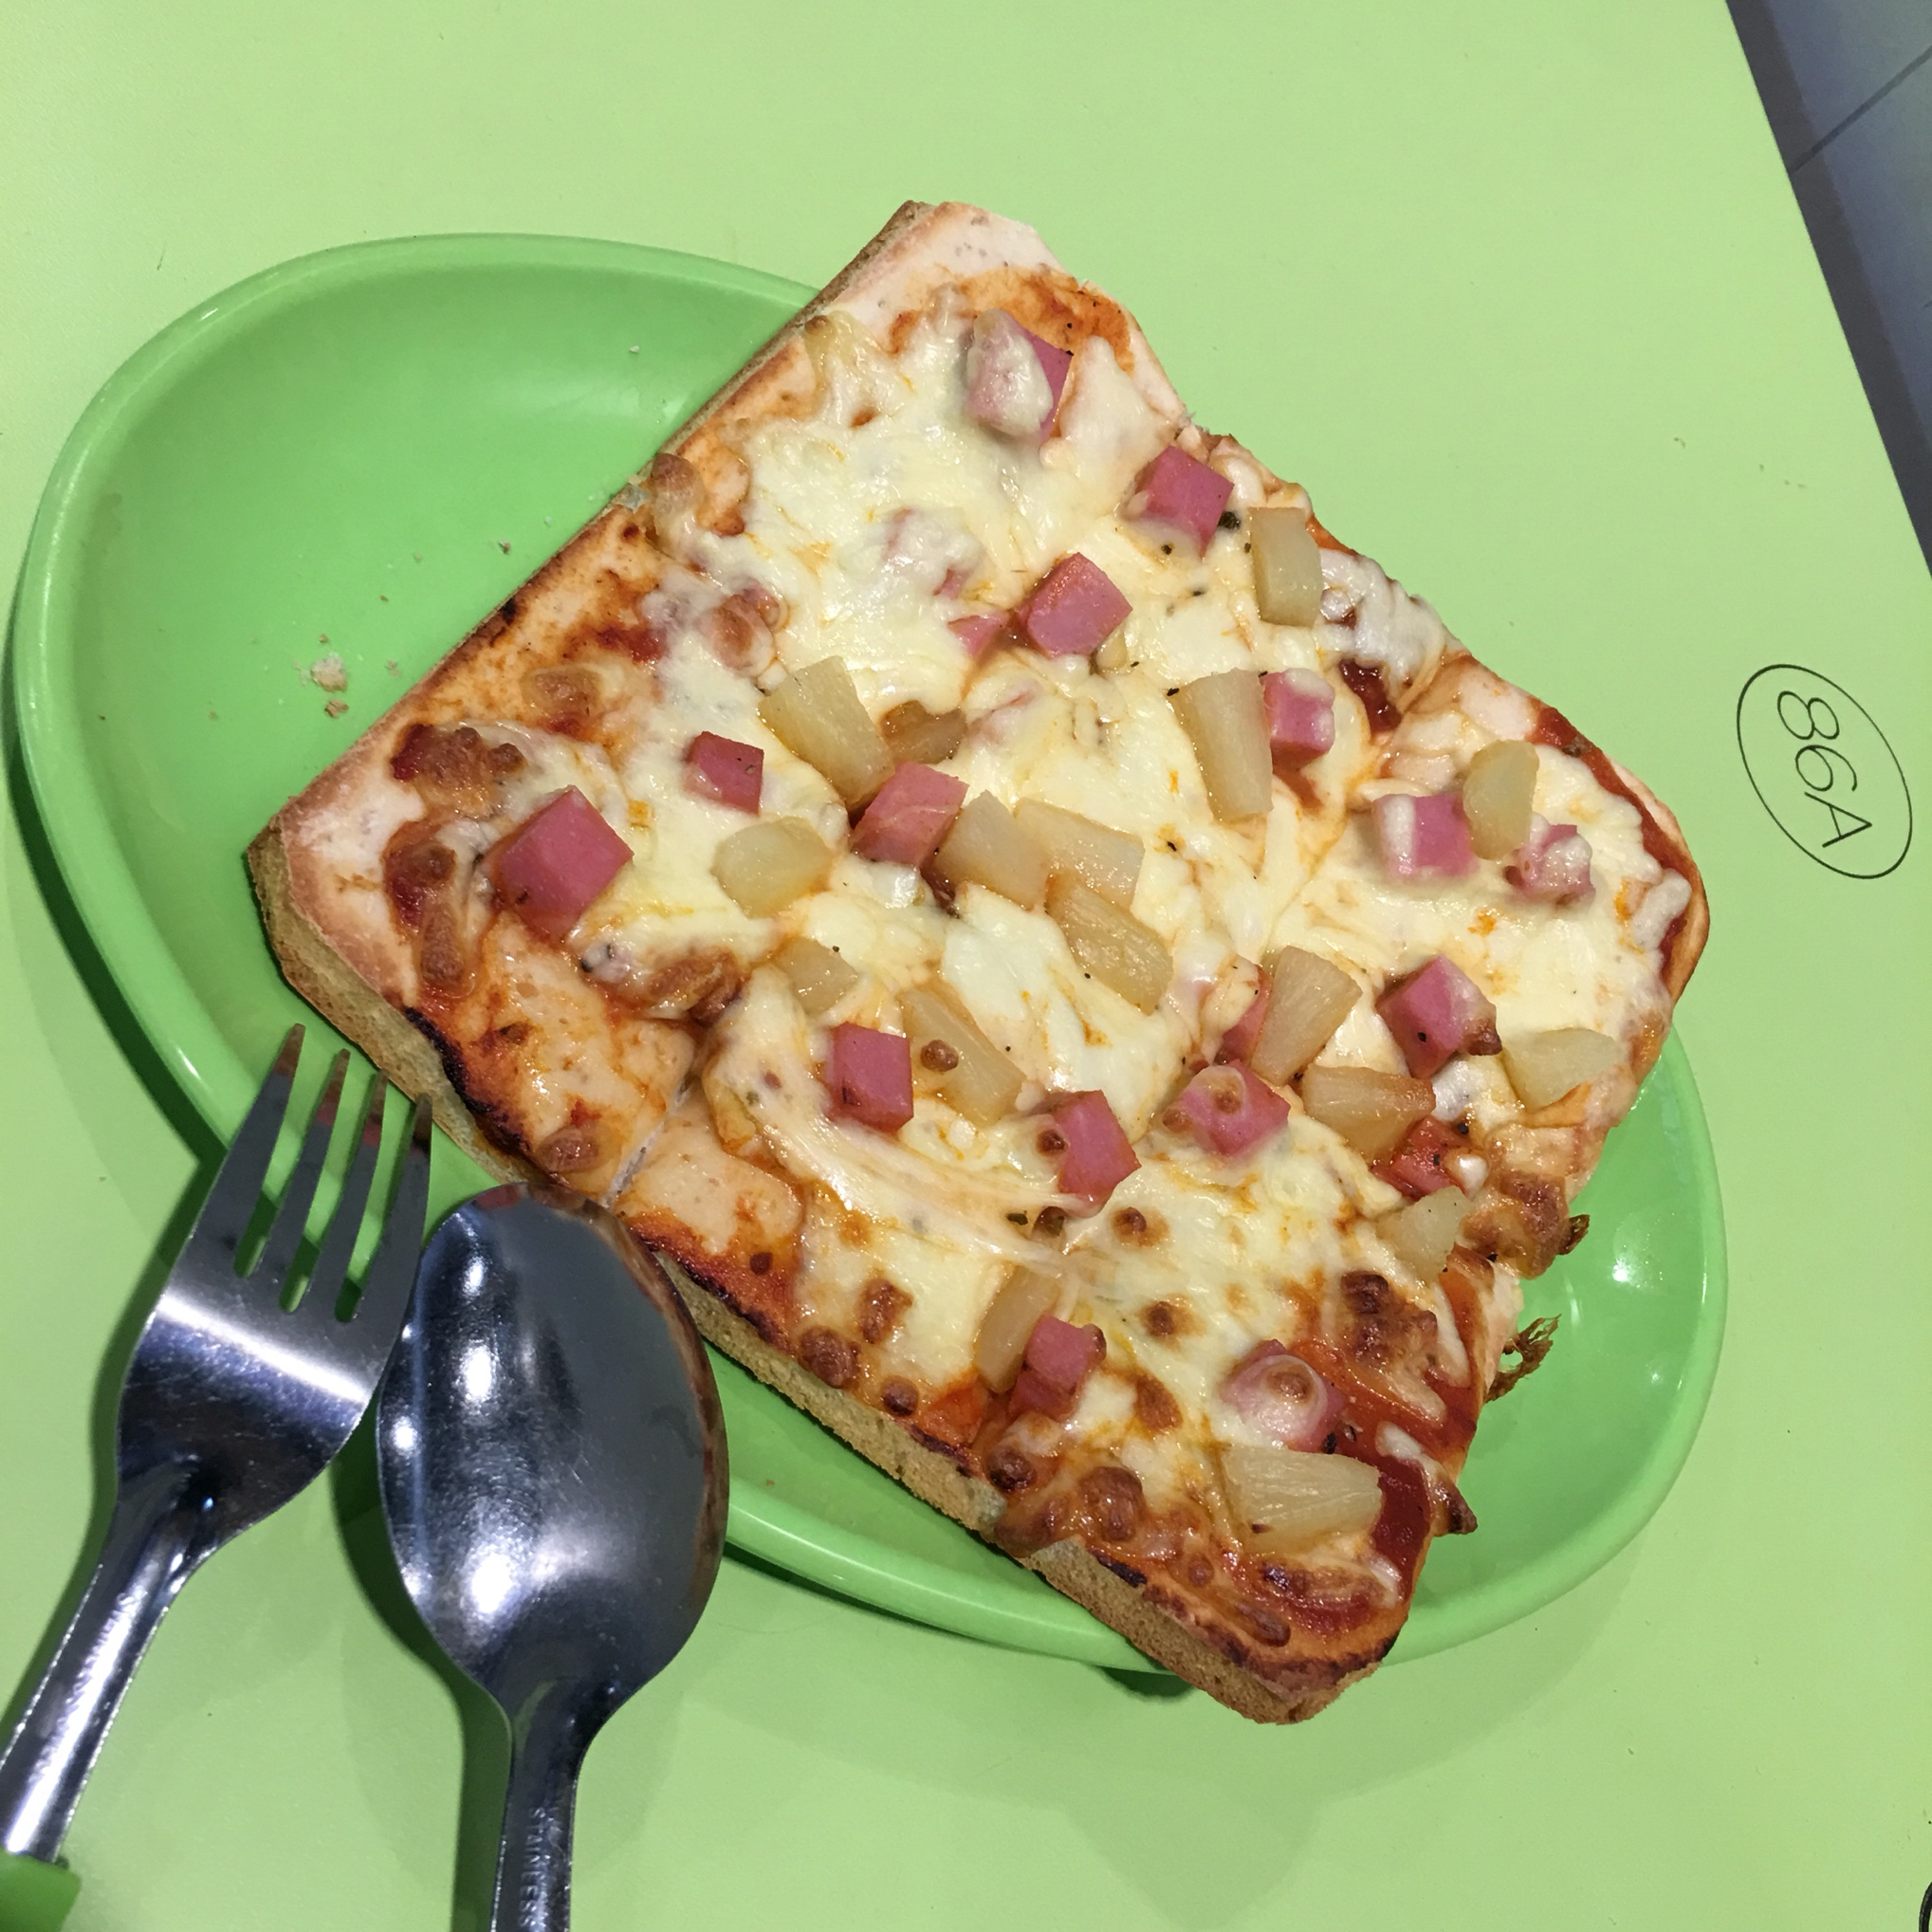 Pizza & Pasta - Cheese